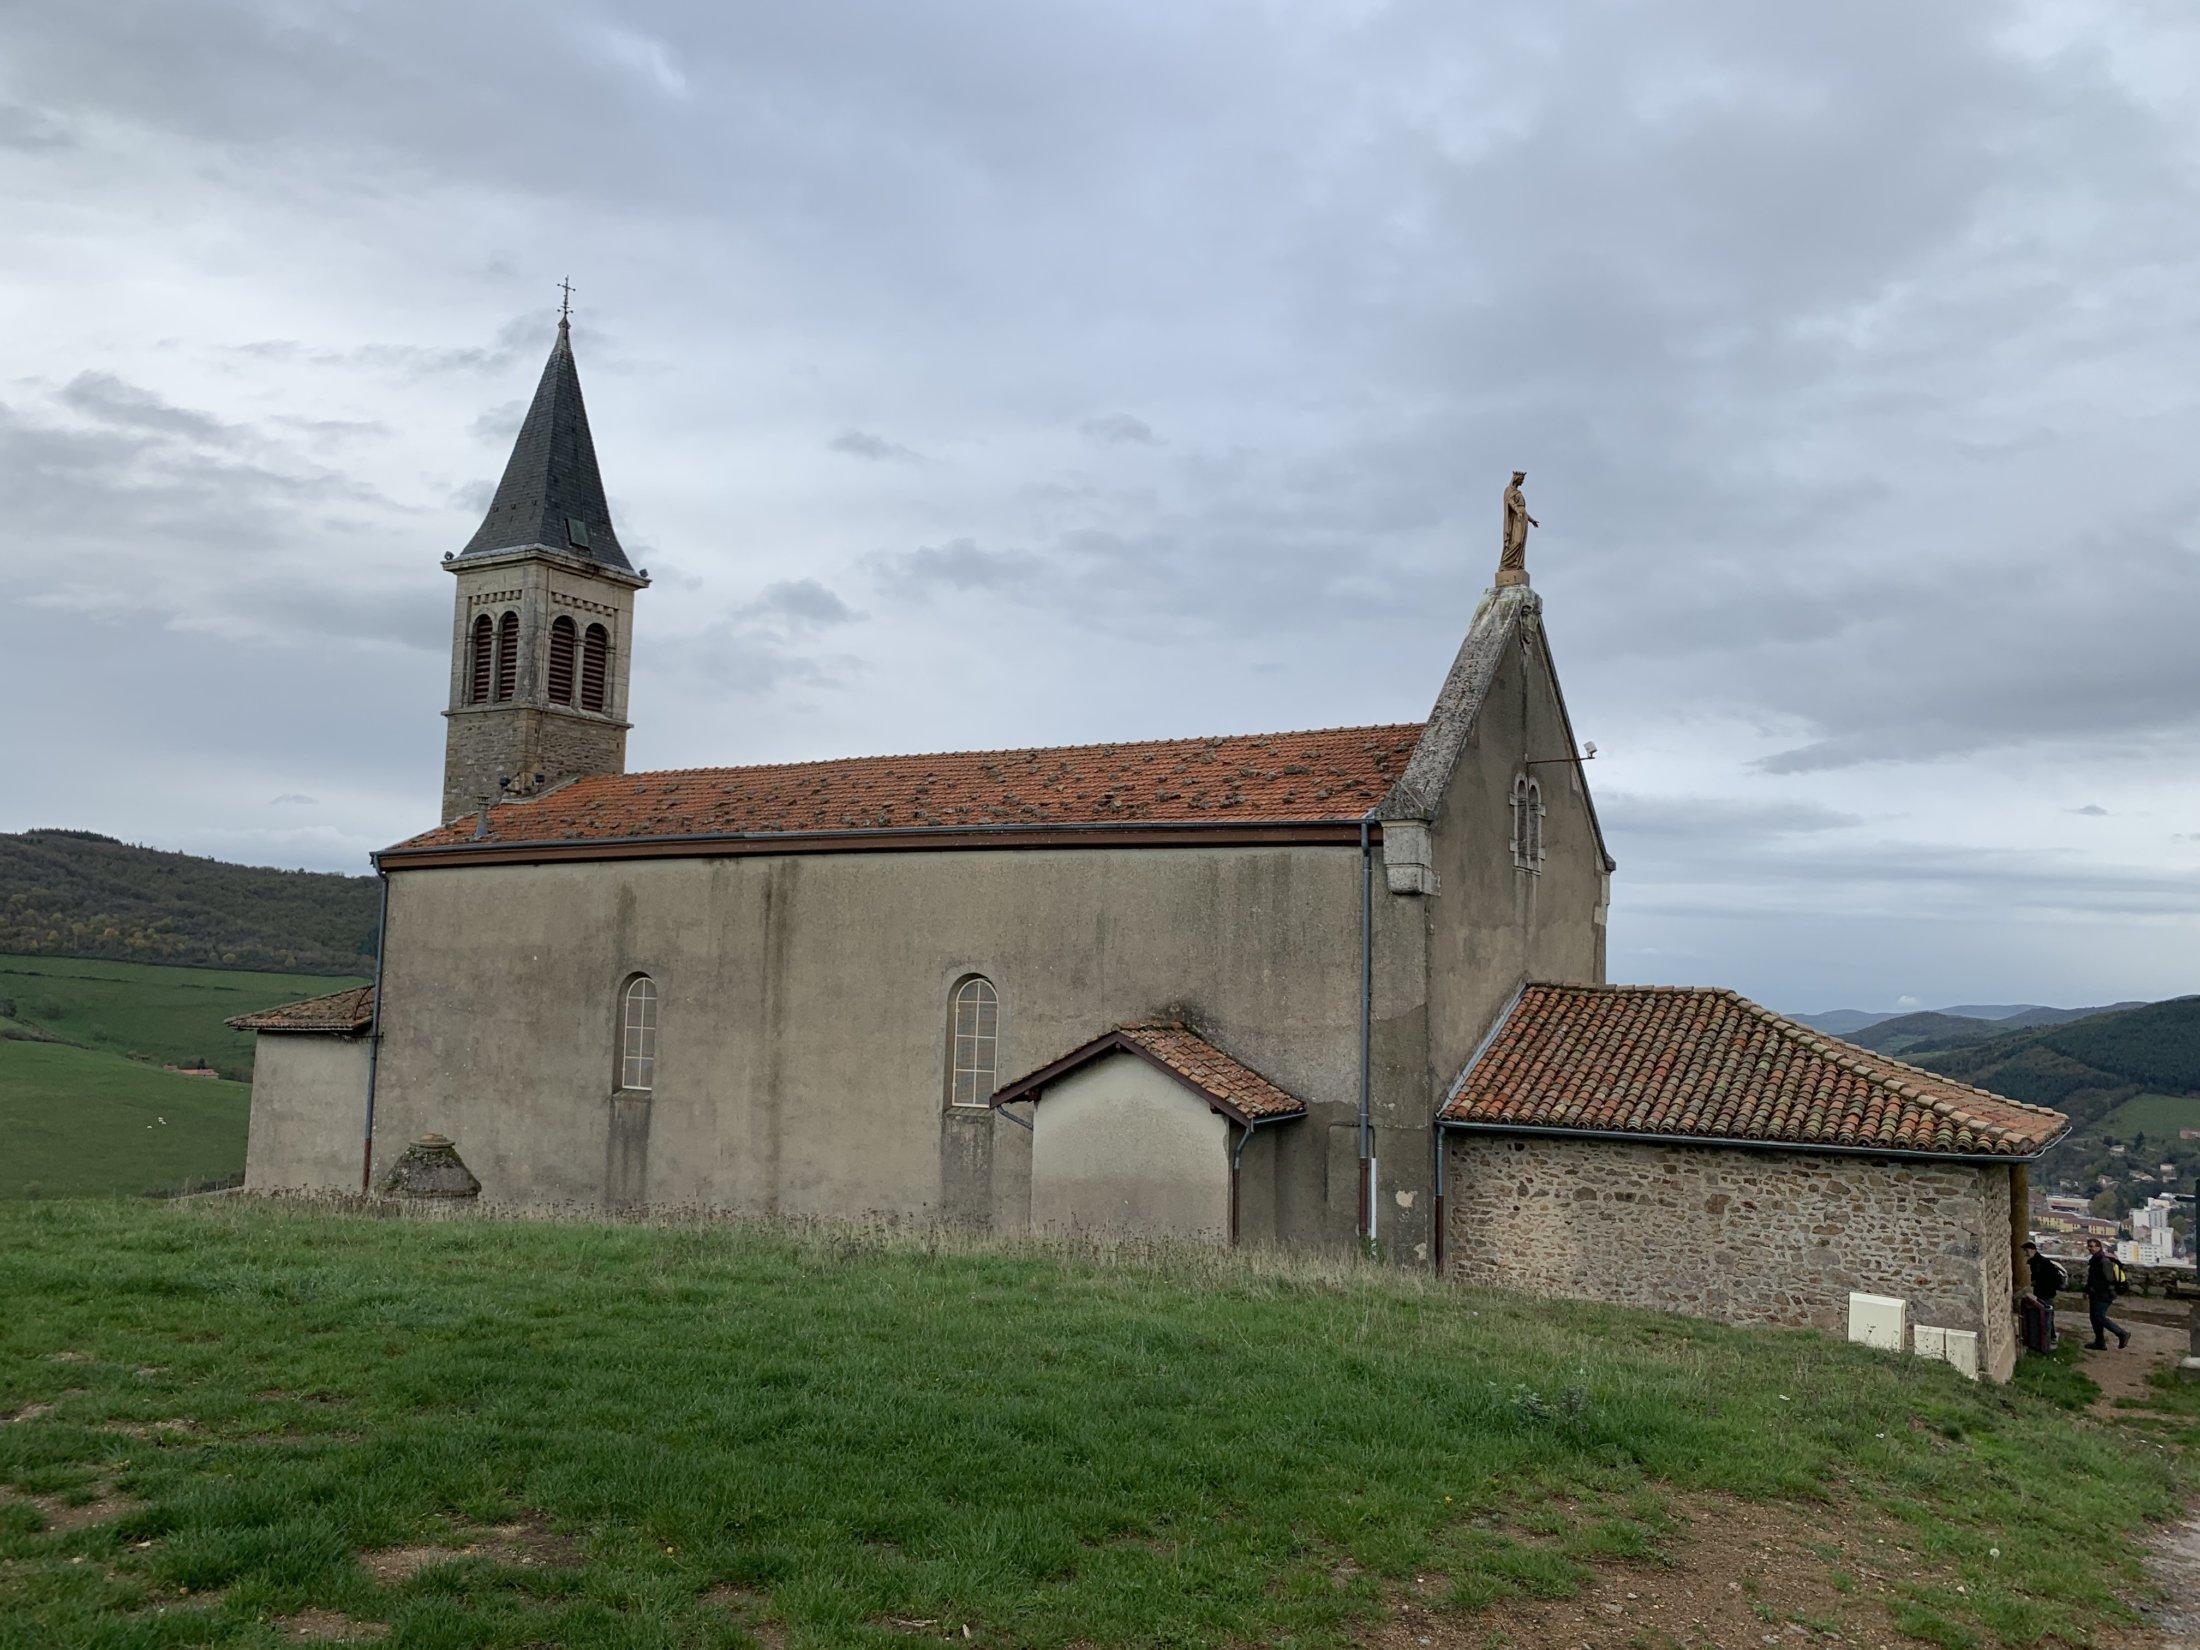 2019.11.07 Nt Dame De La Roche (3)